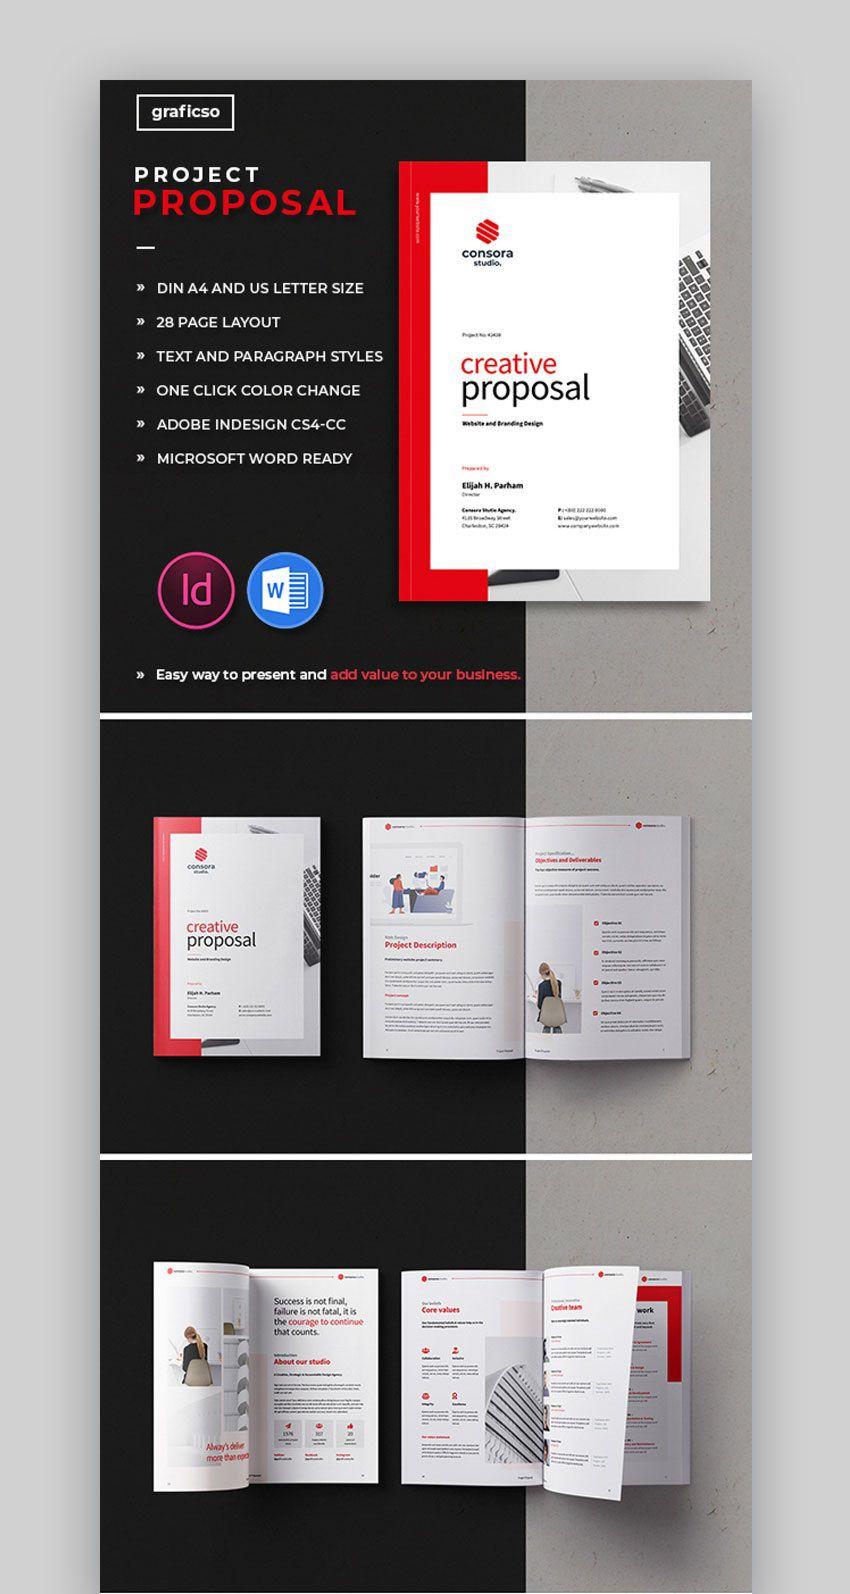 008 Shocking Graphic Design Proposal Template Free High Definition  Freelance Pdf IndesignFull